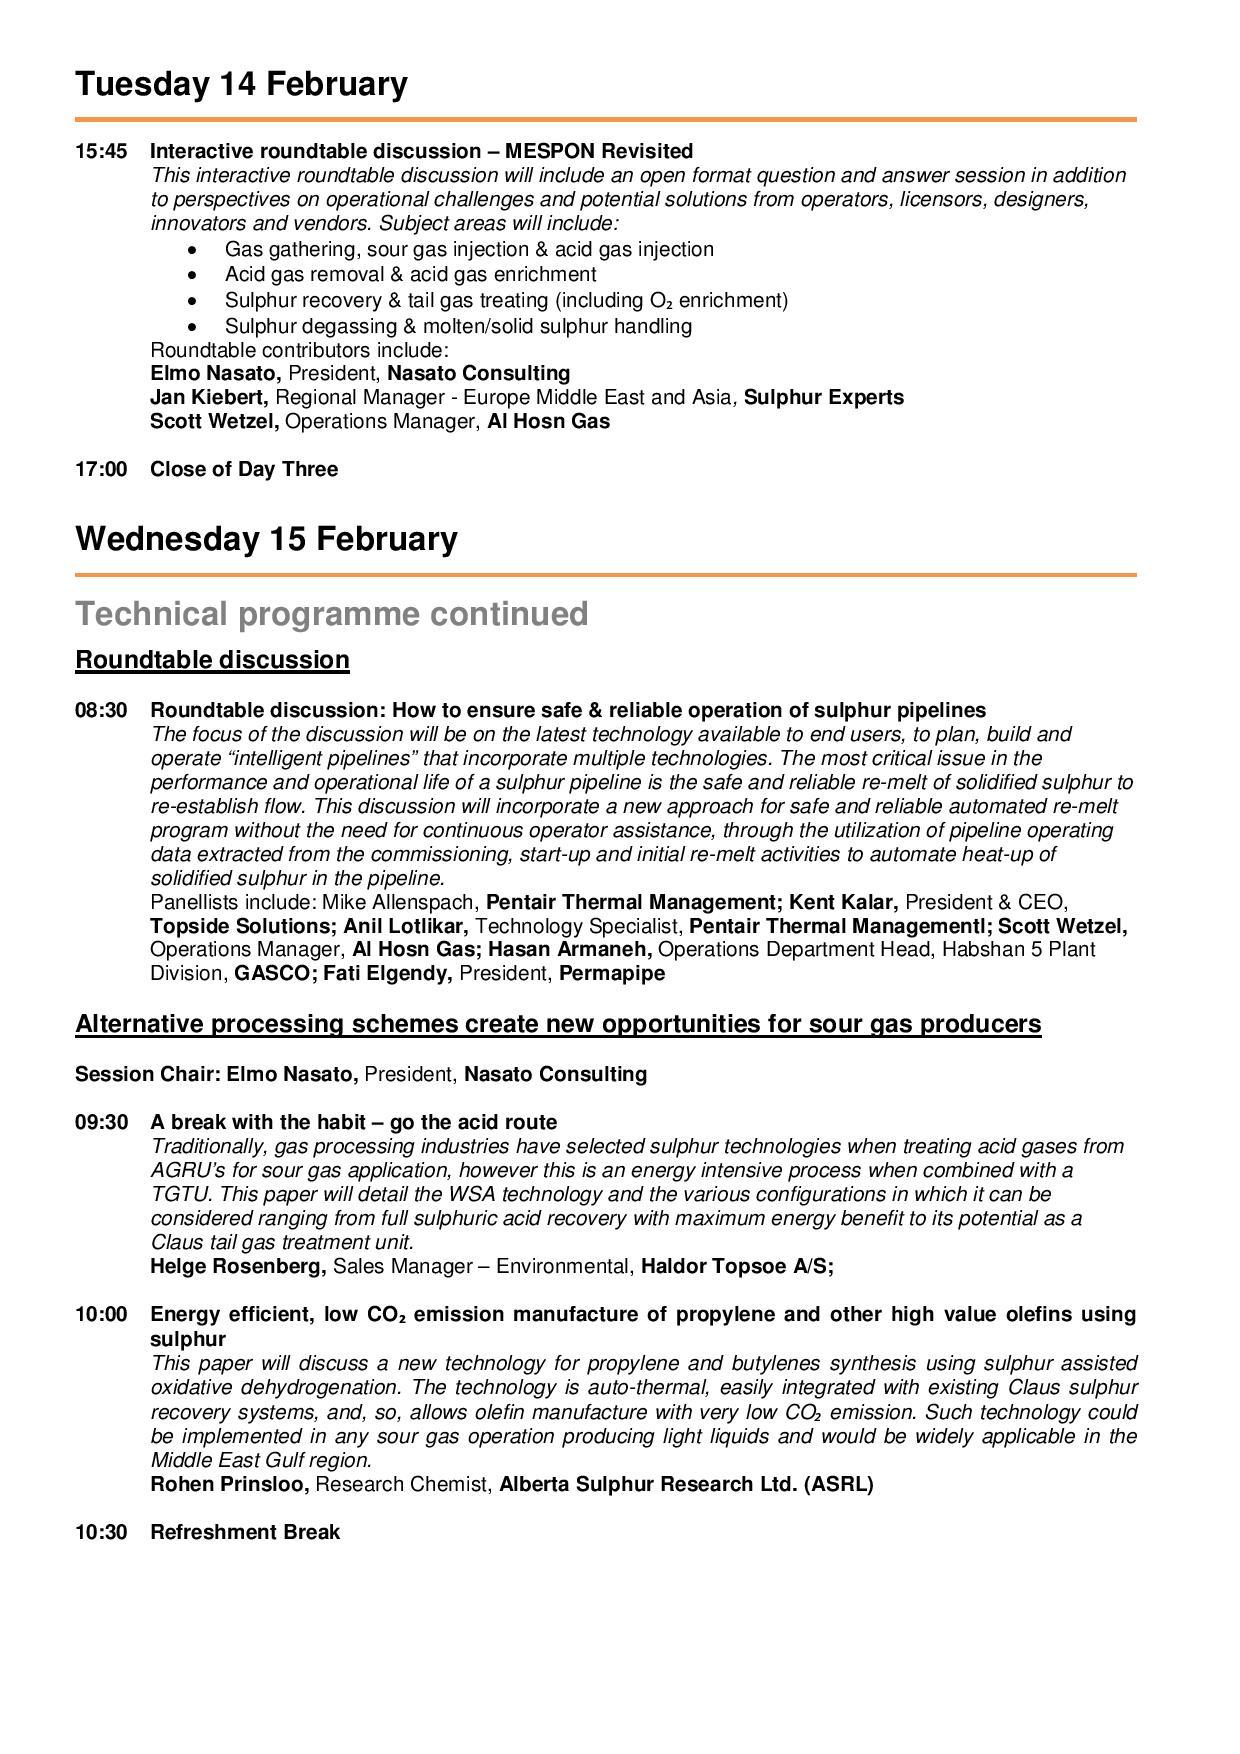 SUME4_-_Agenda_1_-_USE-page-006